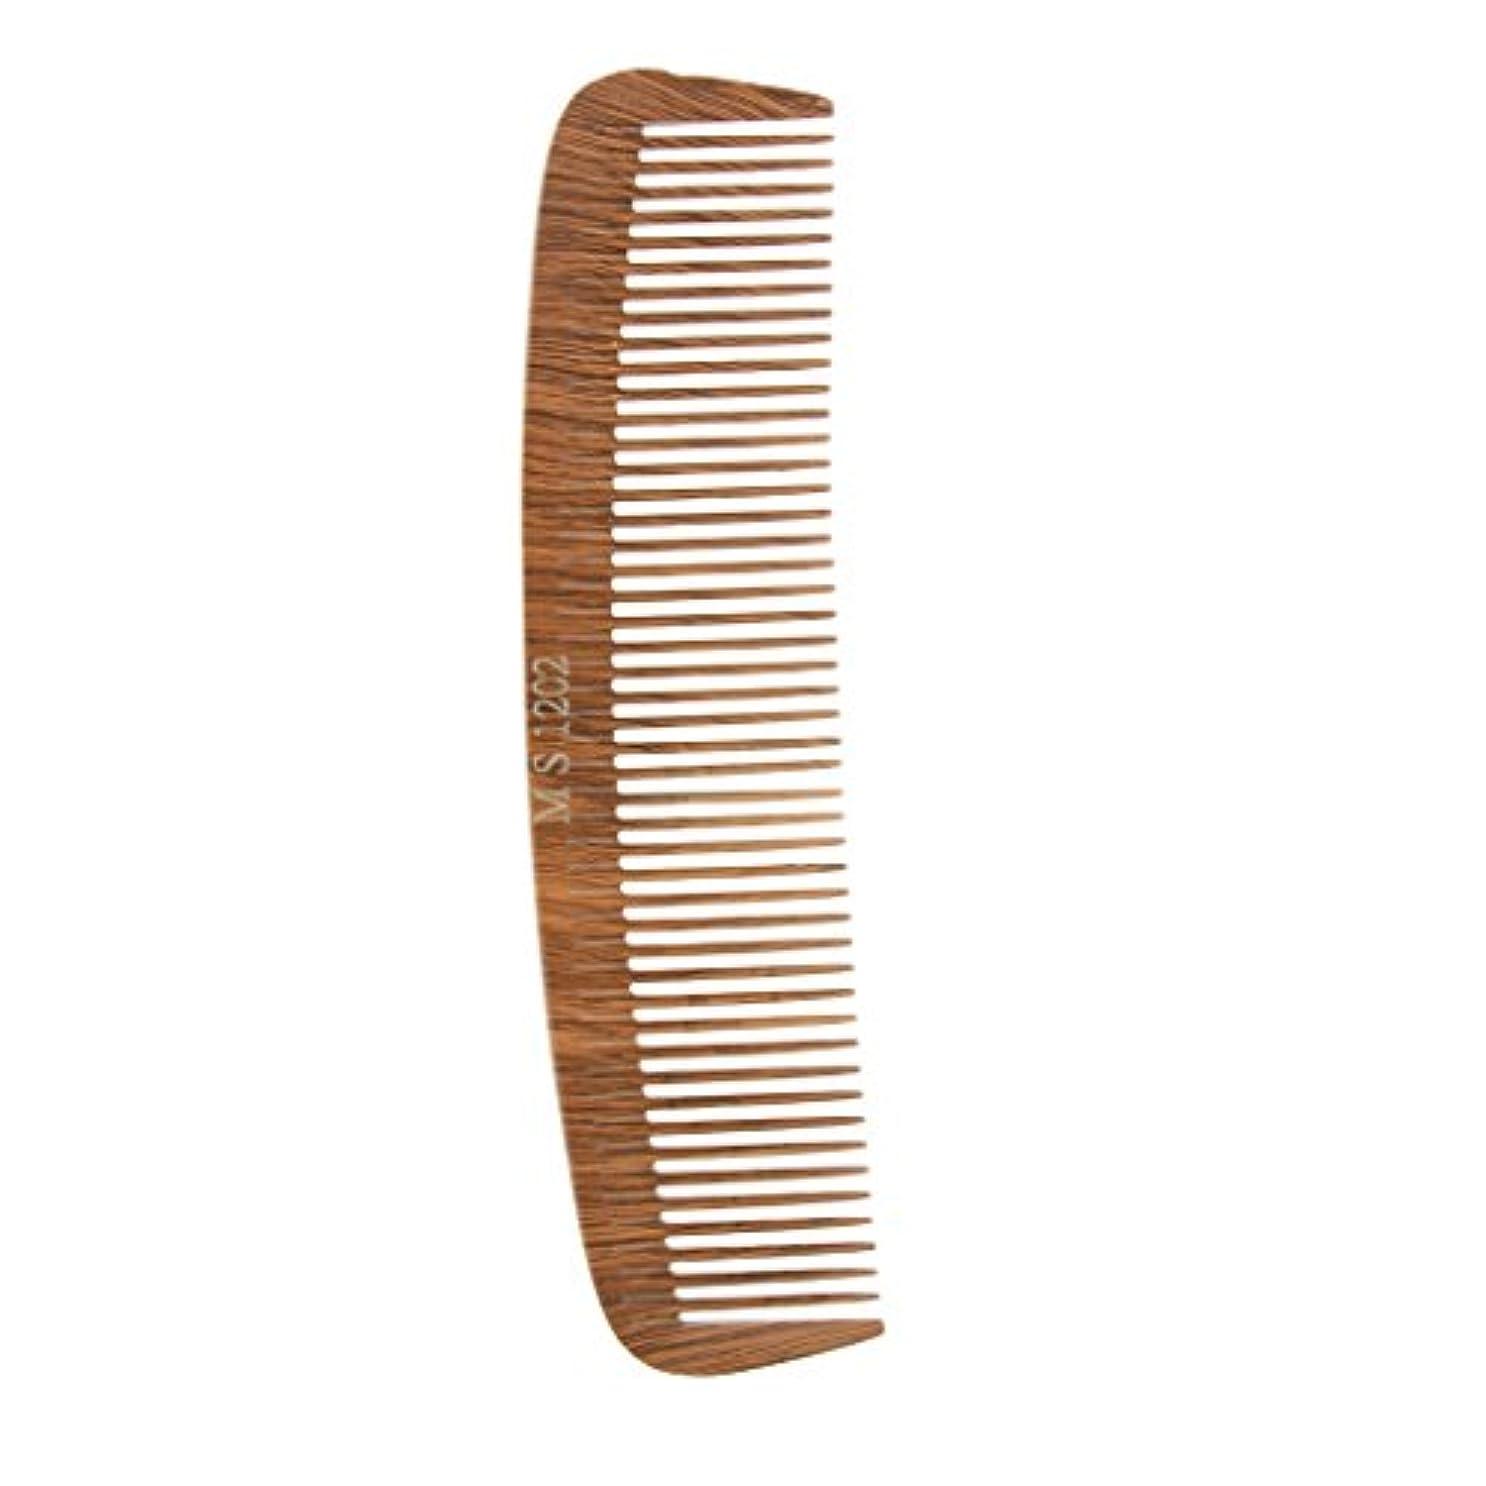 Baosity ヘアカットコーム コーム 木製櫛 帯電防止 4タイプ選べる - 1202